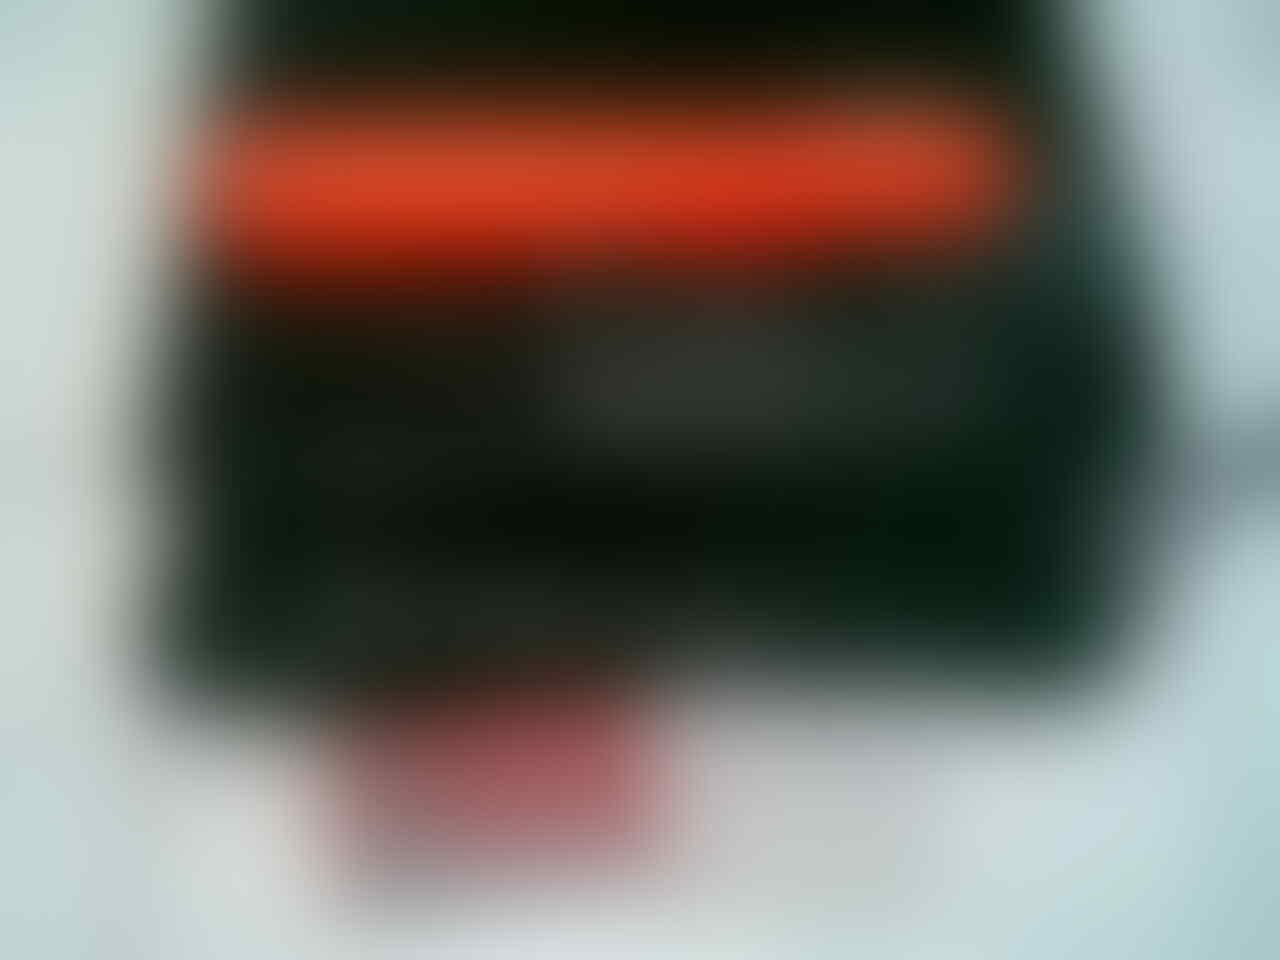 Senter Police T6 5000 watt 2 battery + traffic baton/cone lalin murahhhh